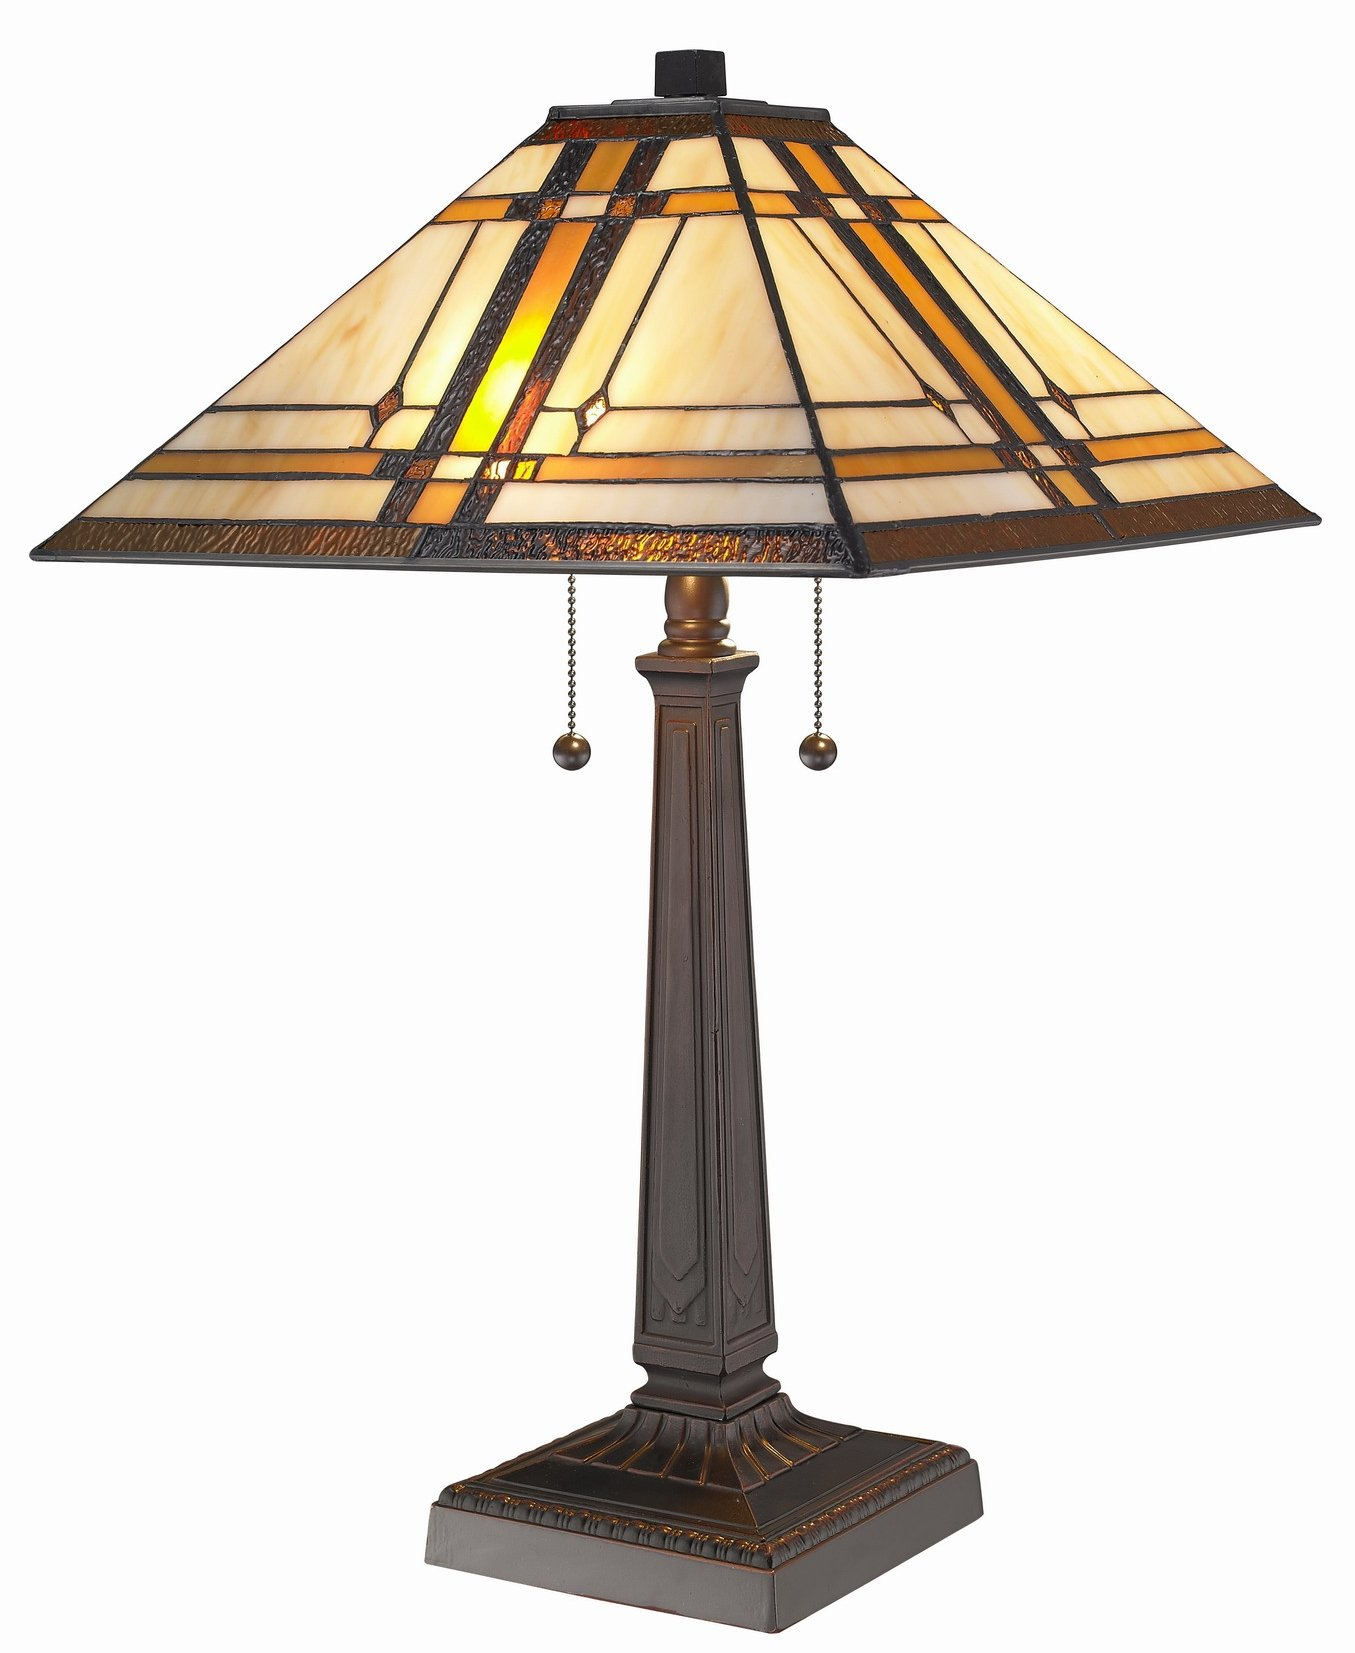 Amora Lighting AM1053TL14 Tiffany Style Mission Design Table Lamp